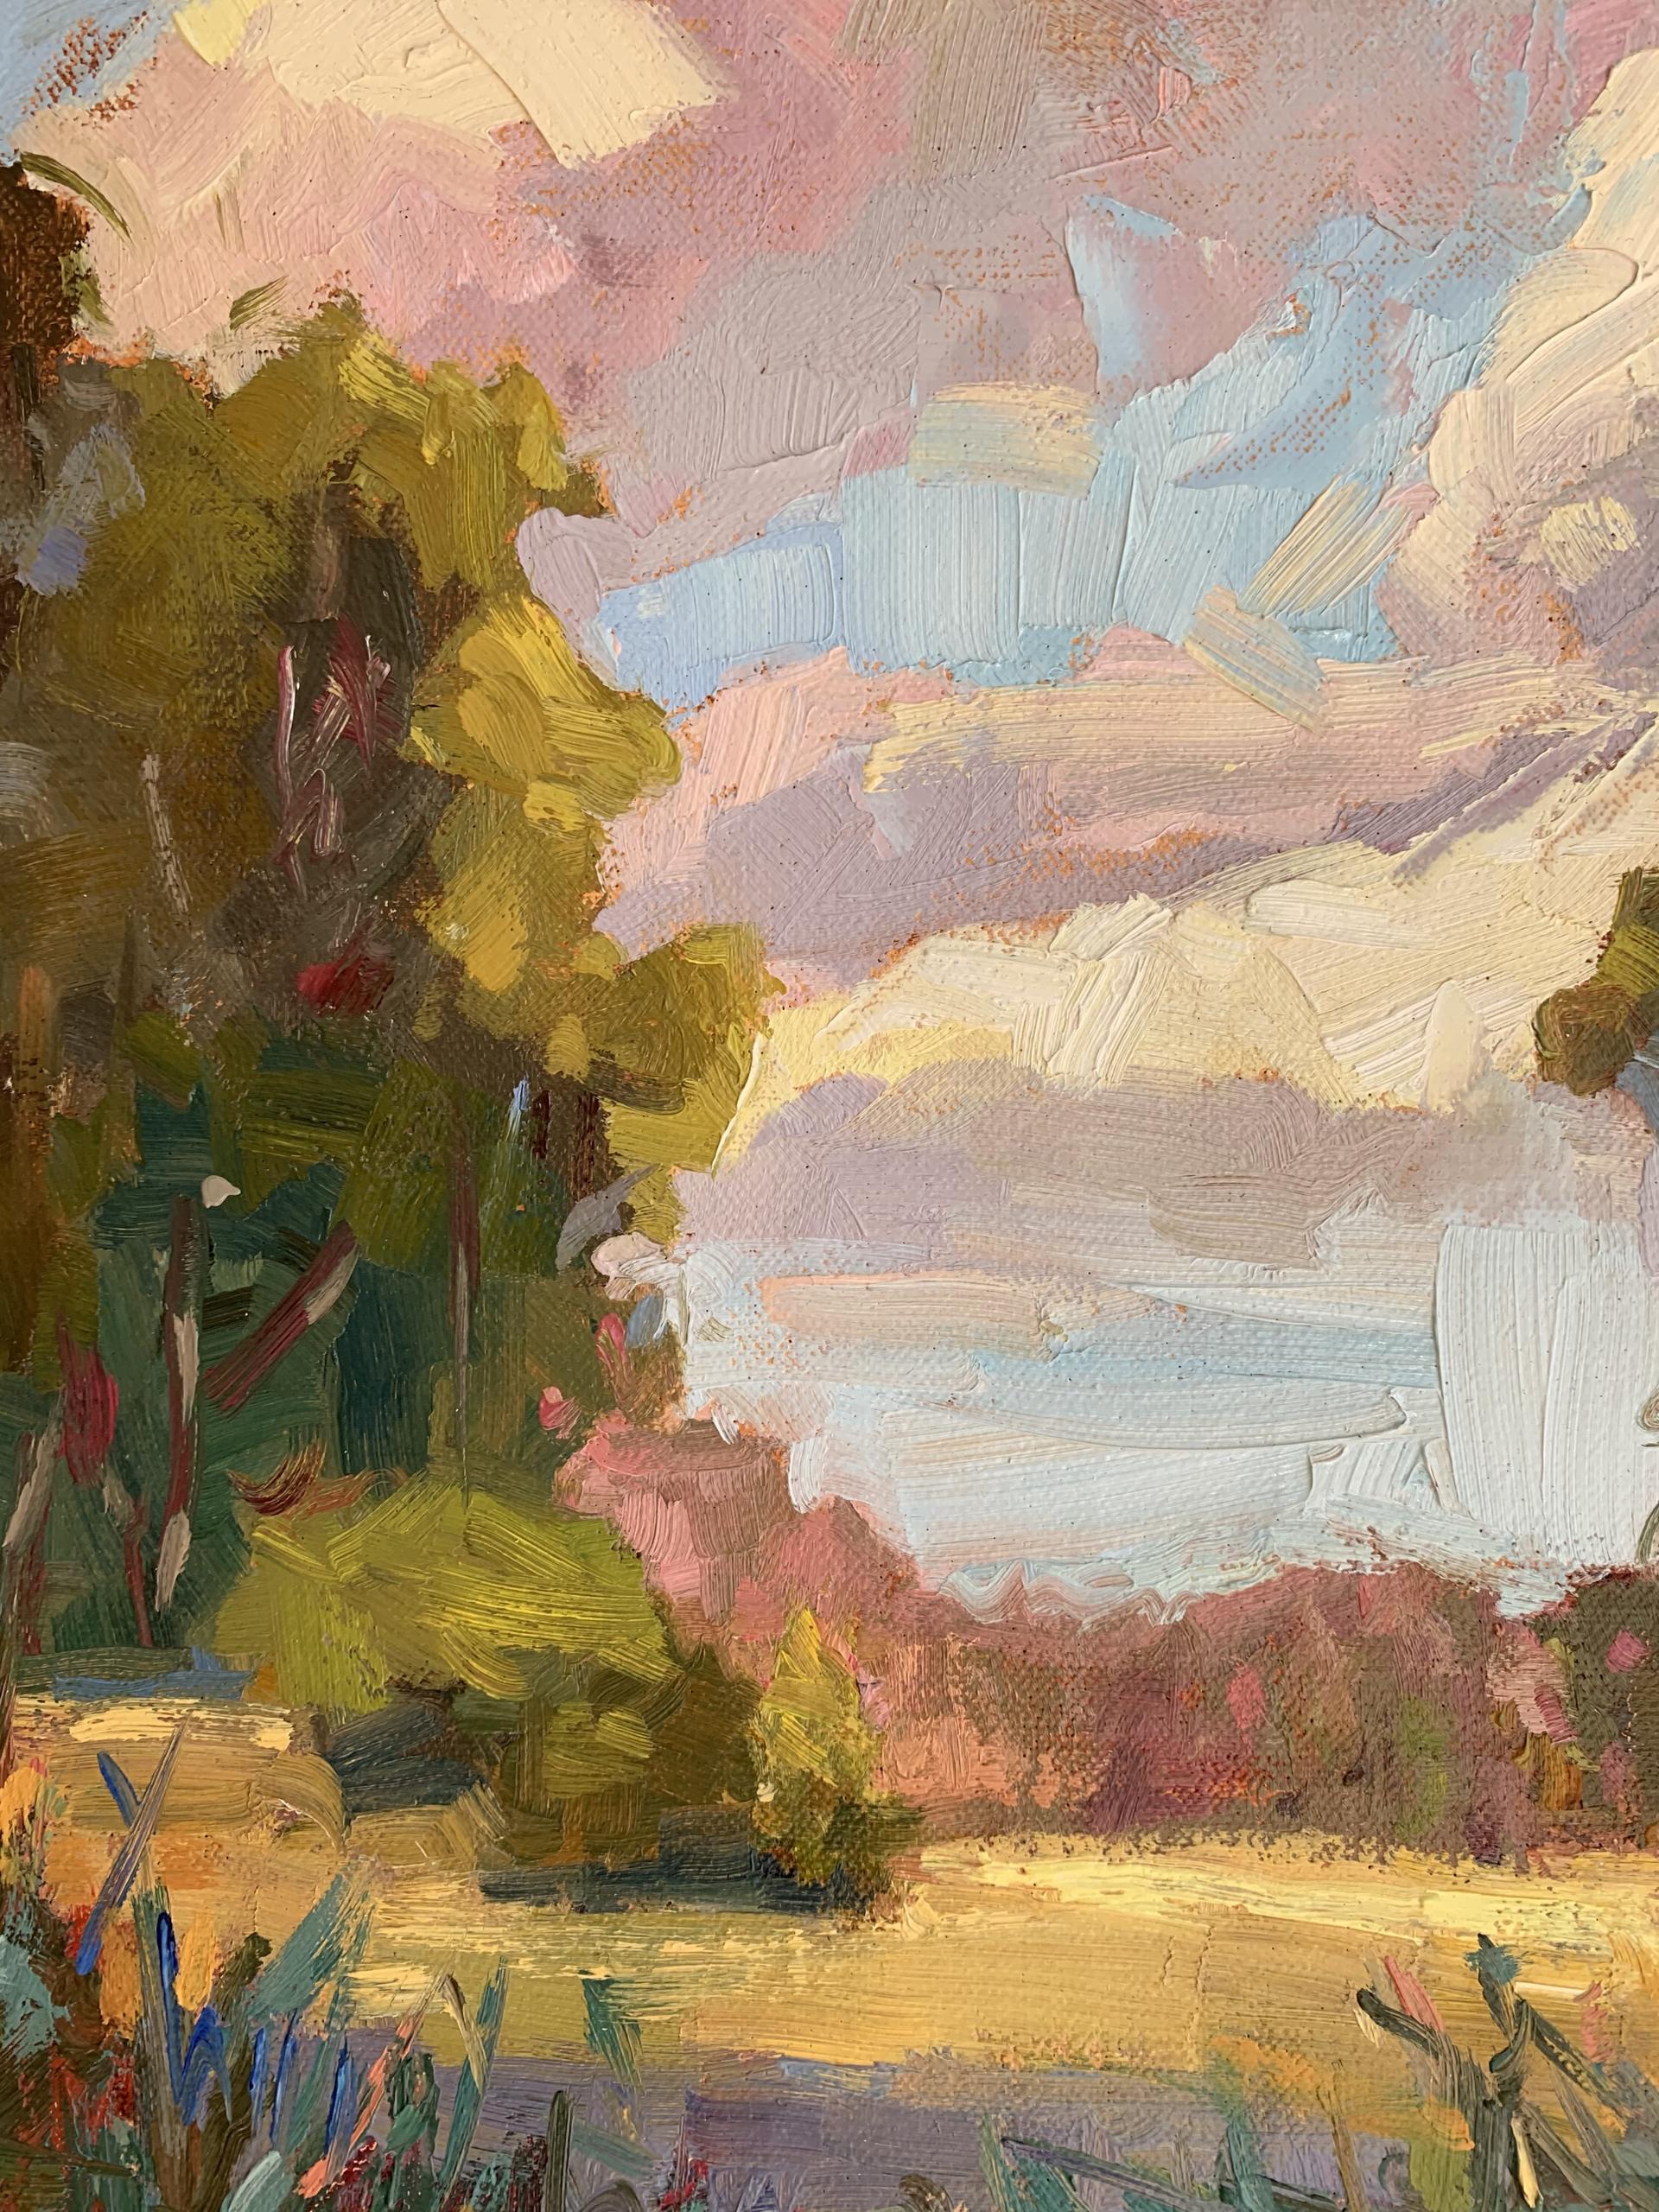 Cool Shadows by Marissa Vogl